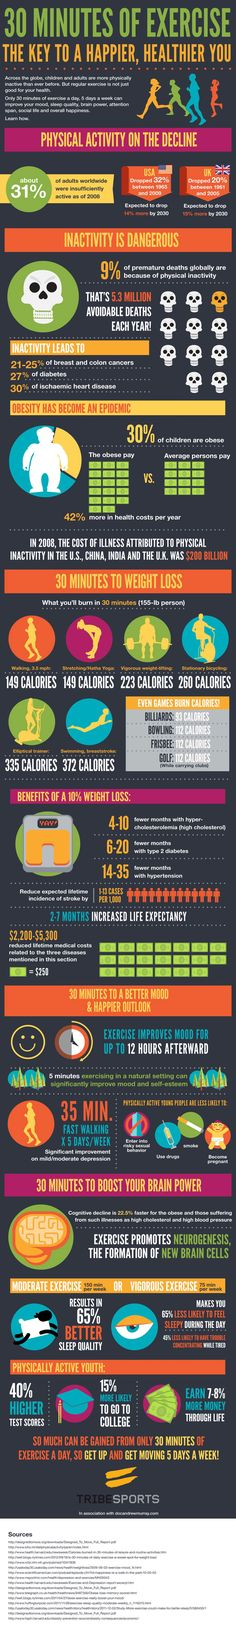 30 Minutes Of Exercise Infographic http://miricbiotechltd.tumblr.com/miric%20biotech%20ltd #miricbiotech #miricbiotechltd #miricbiotechlimited